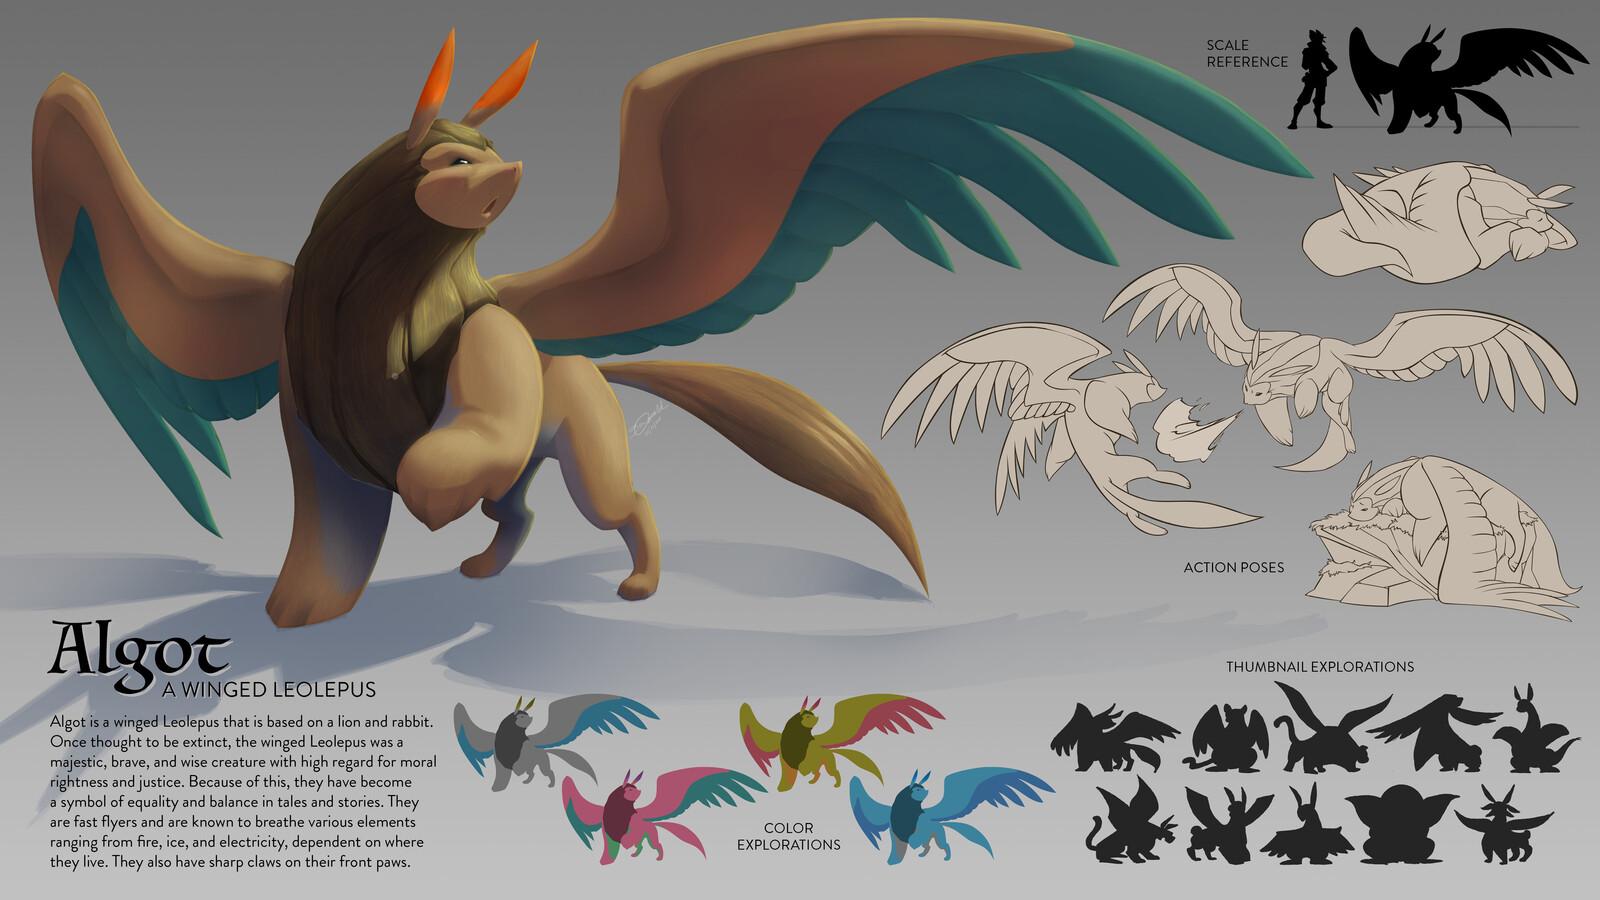 Algot, the Winged Leolepus